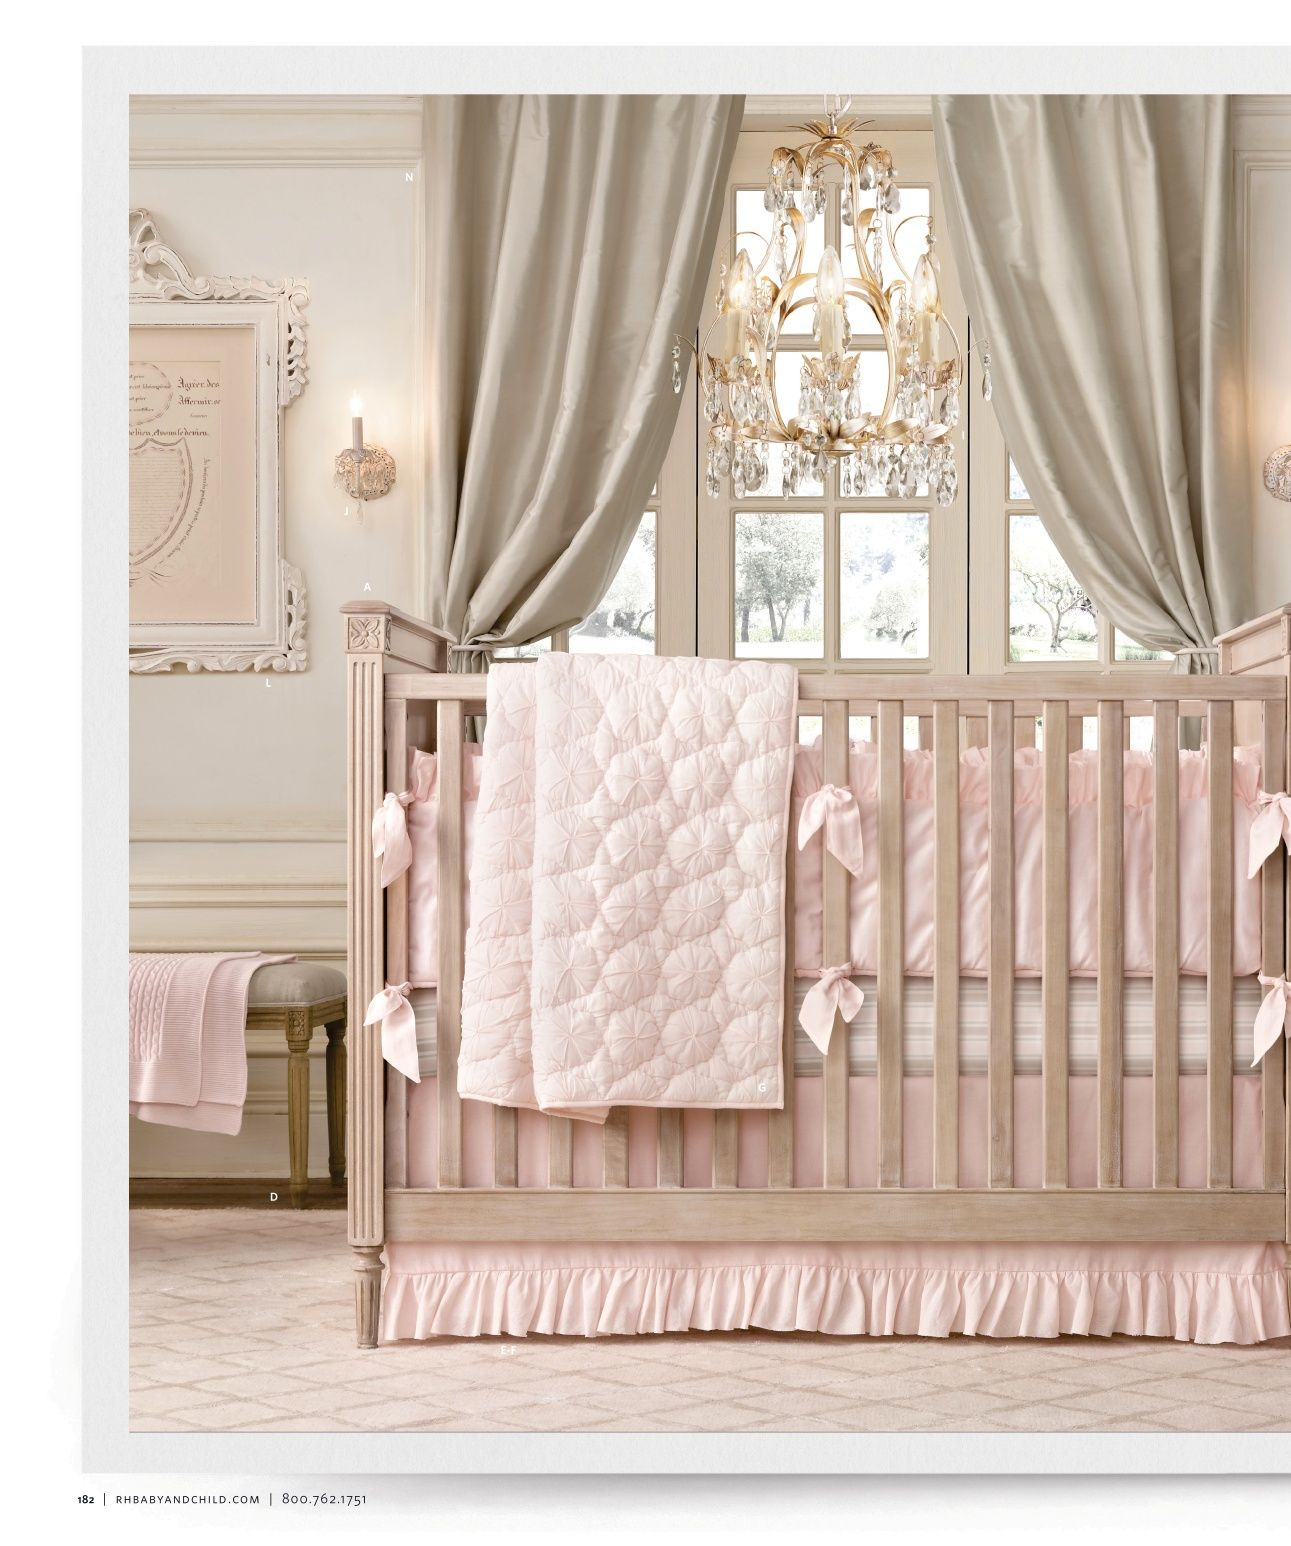 22 Baby Room Designs And Beautiful Nursery Decorating Ideas: Restoration Hardware Baby & Child